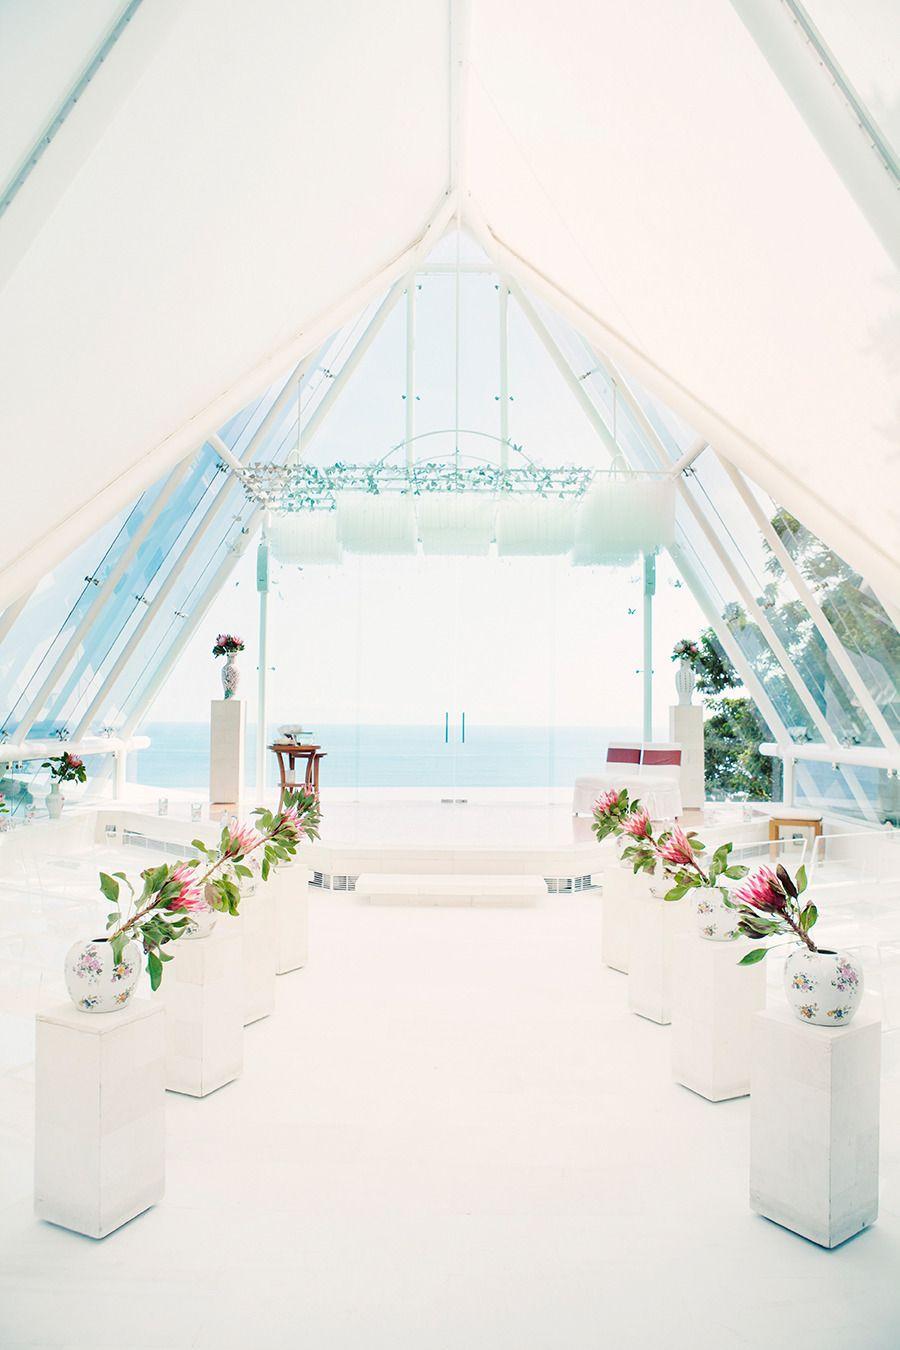 Bali wedding venues on the beach   Amazing Wedding Venues  Wedding venues Destinations and Weddings